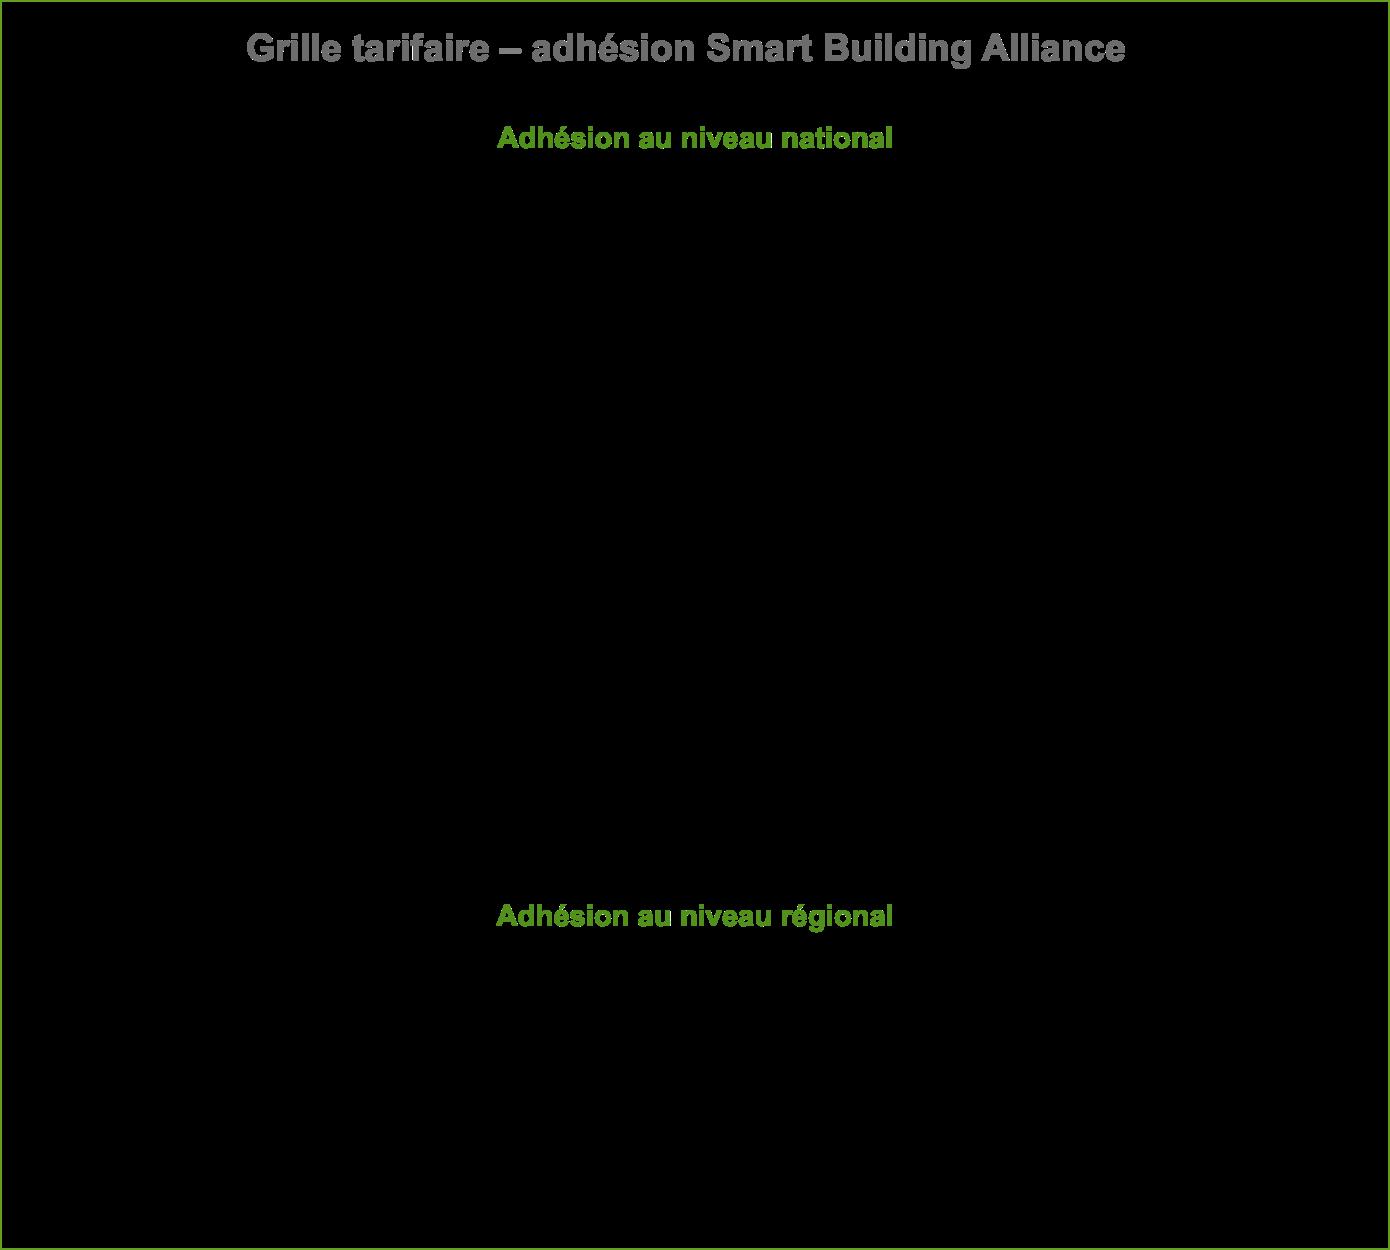 GRILLE-TARIFAIRE-ADHESION-SBA_28-08-2020